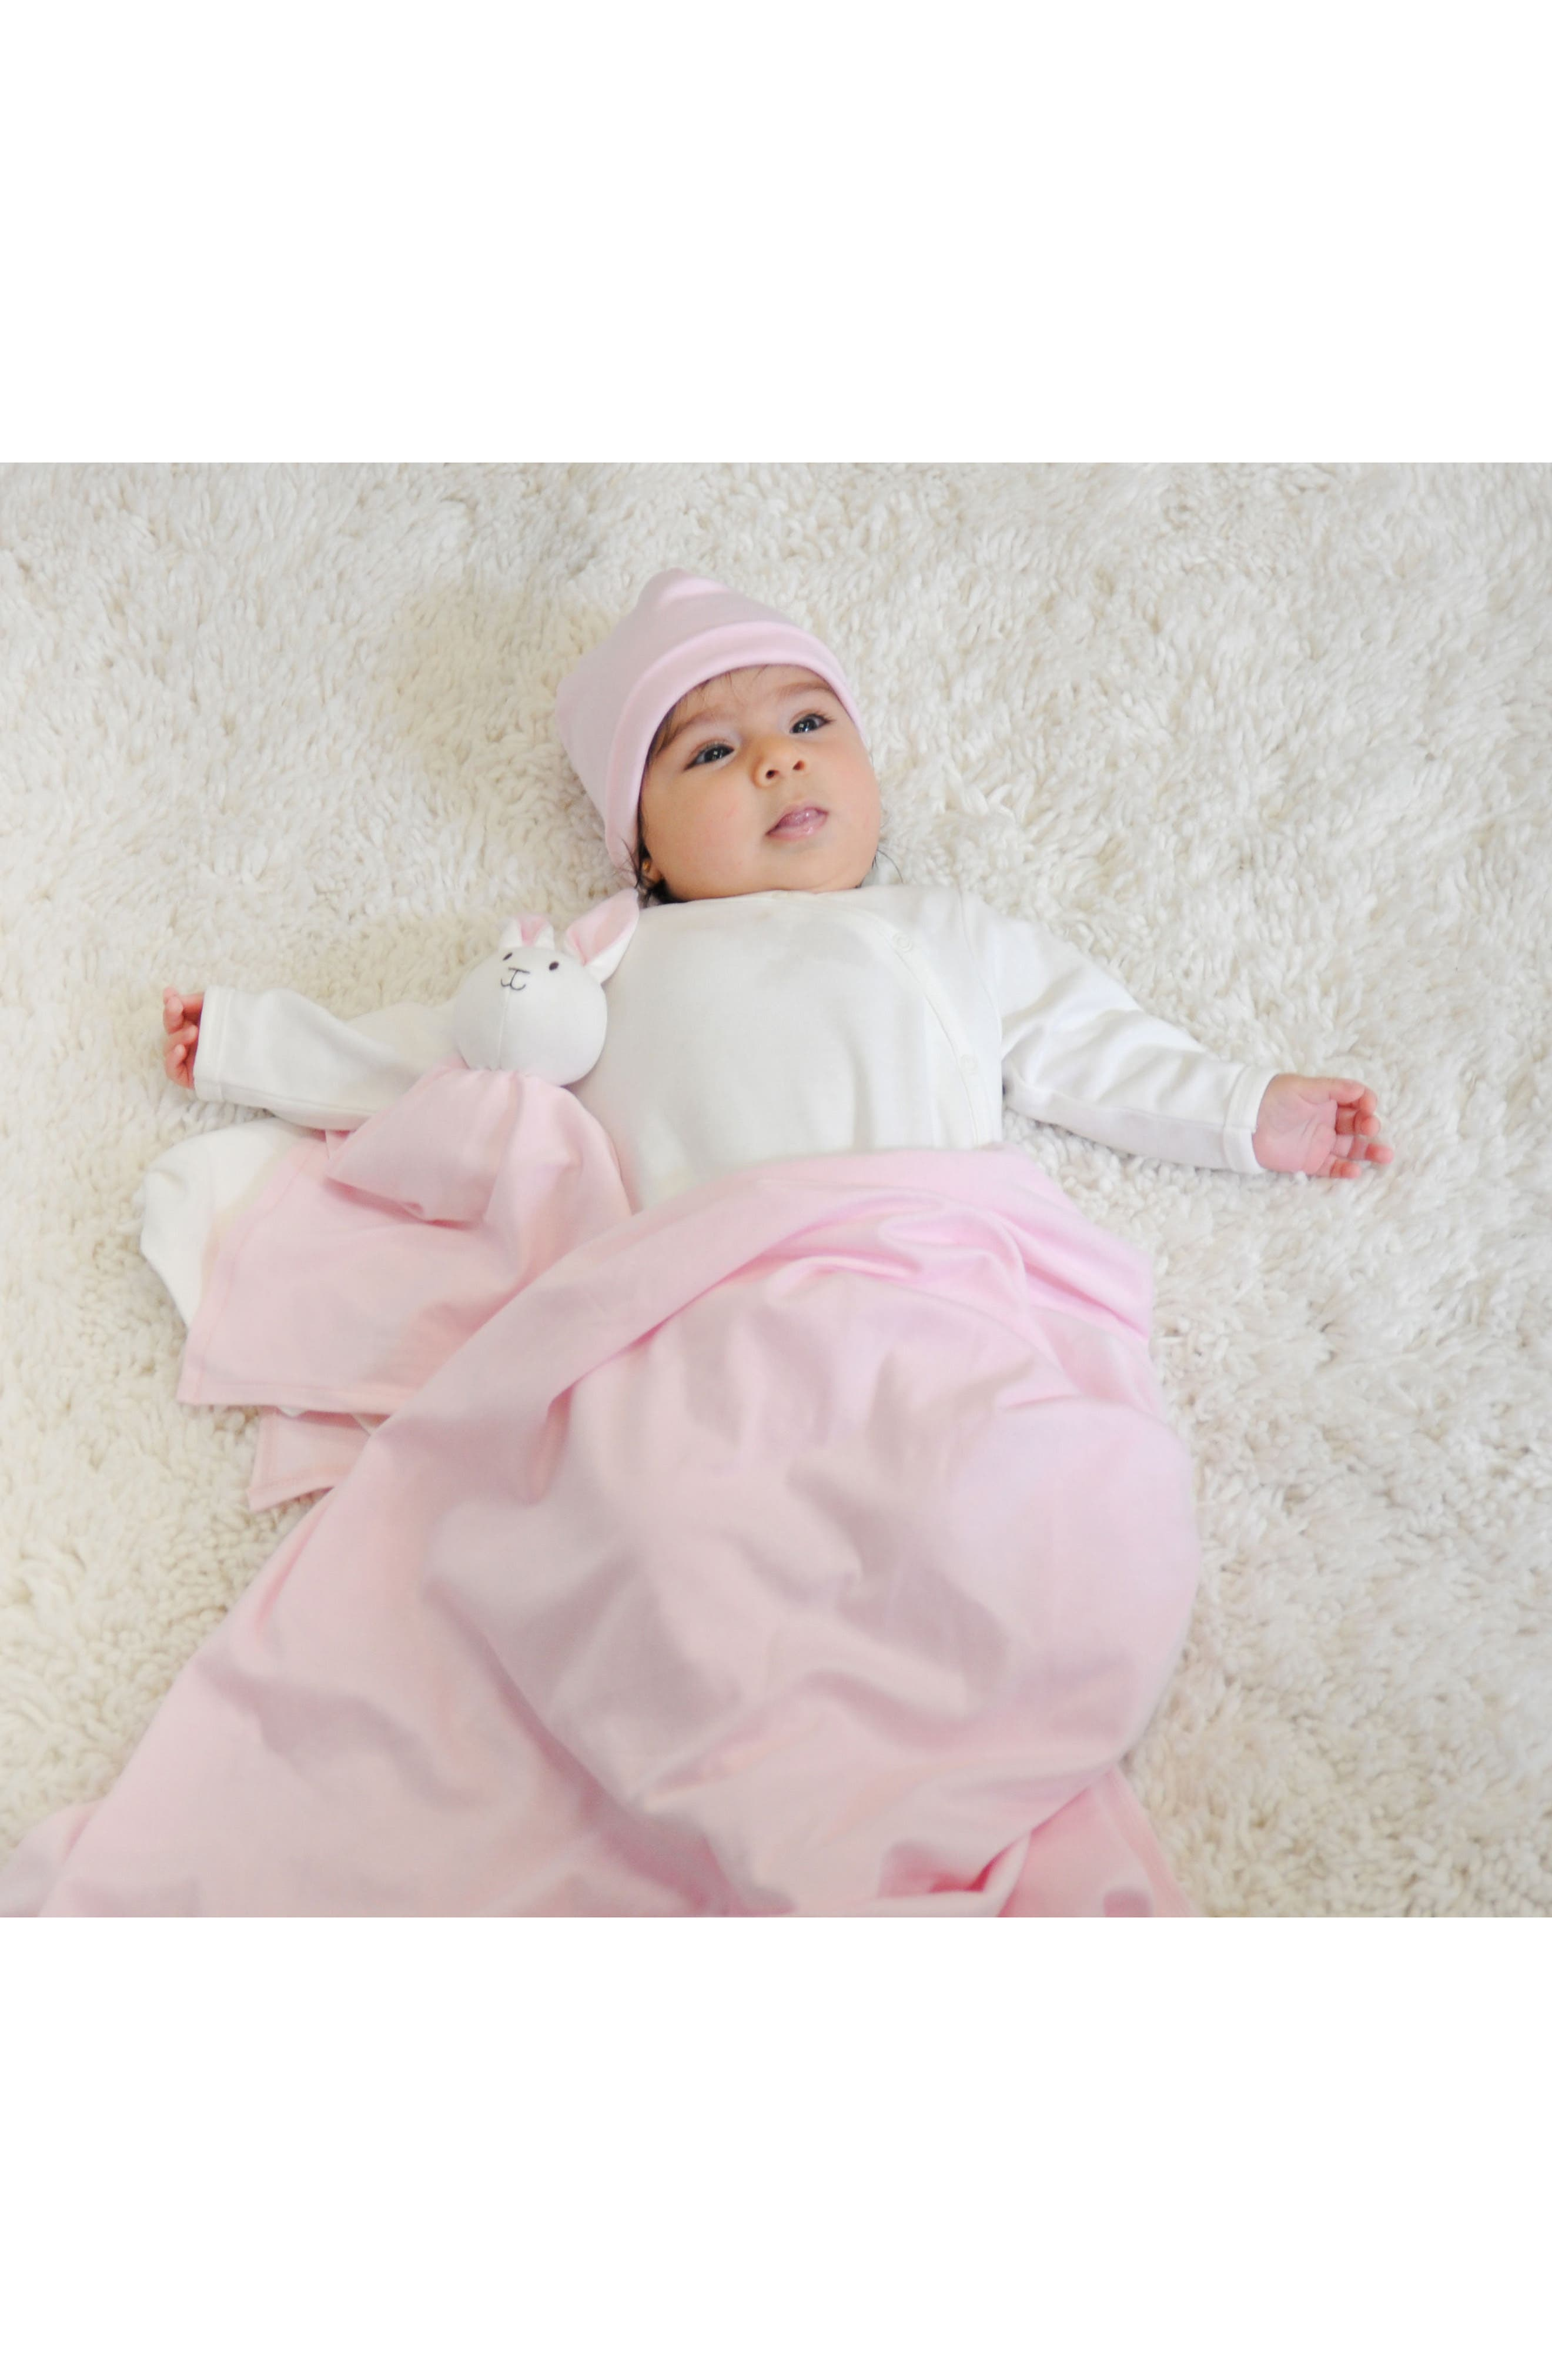 4-Piece Swaddle Blanket, Beanie & Rabbit Lovey Toy Set,                             Alternate thumbnail 2, color,                             Pink